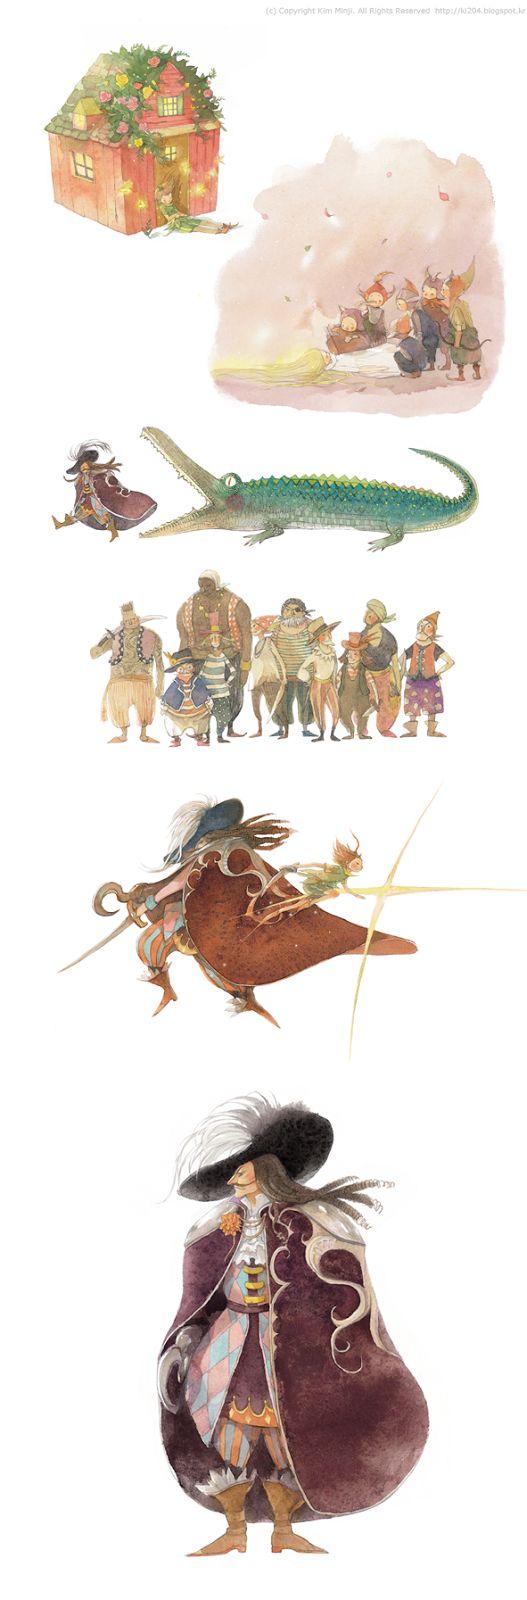 lunavis: Peter Pan